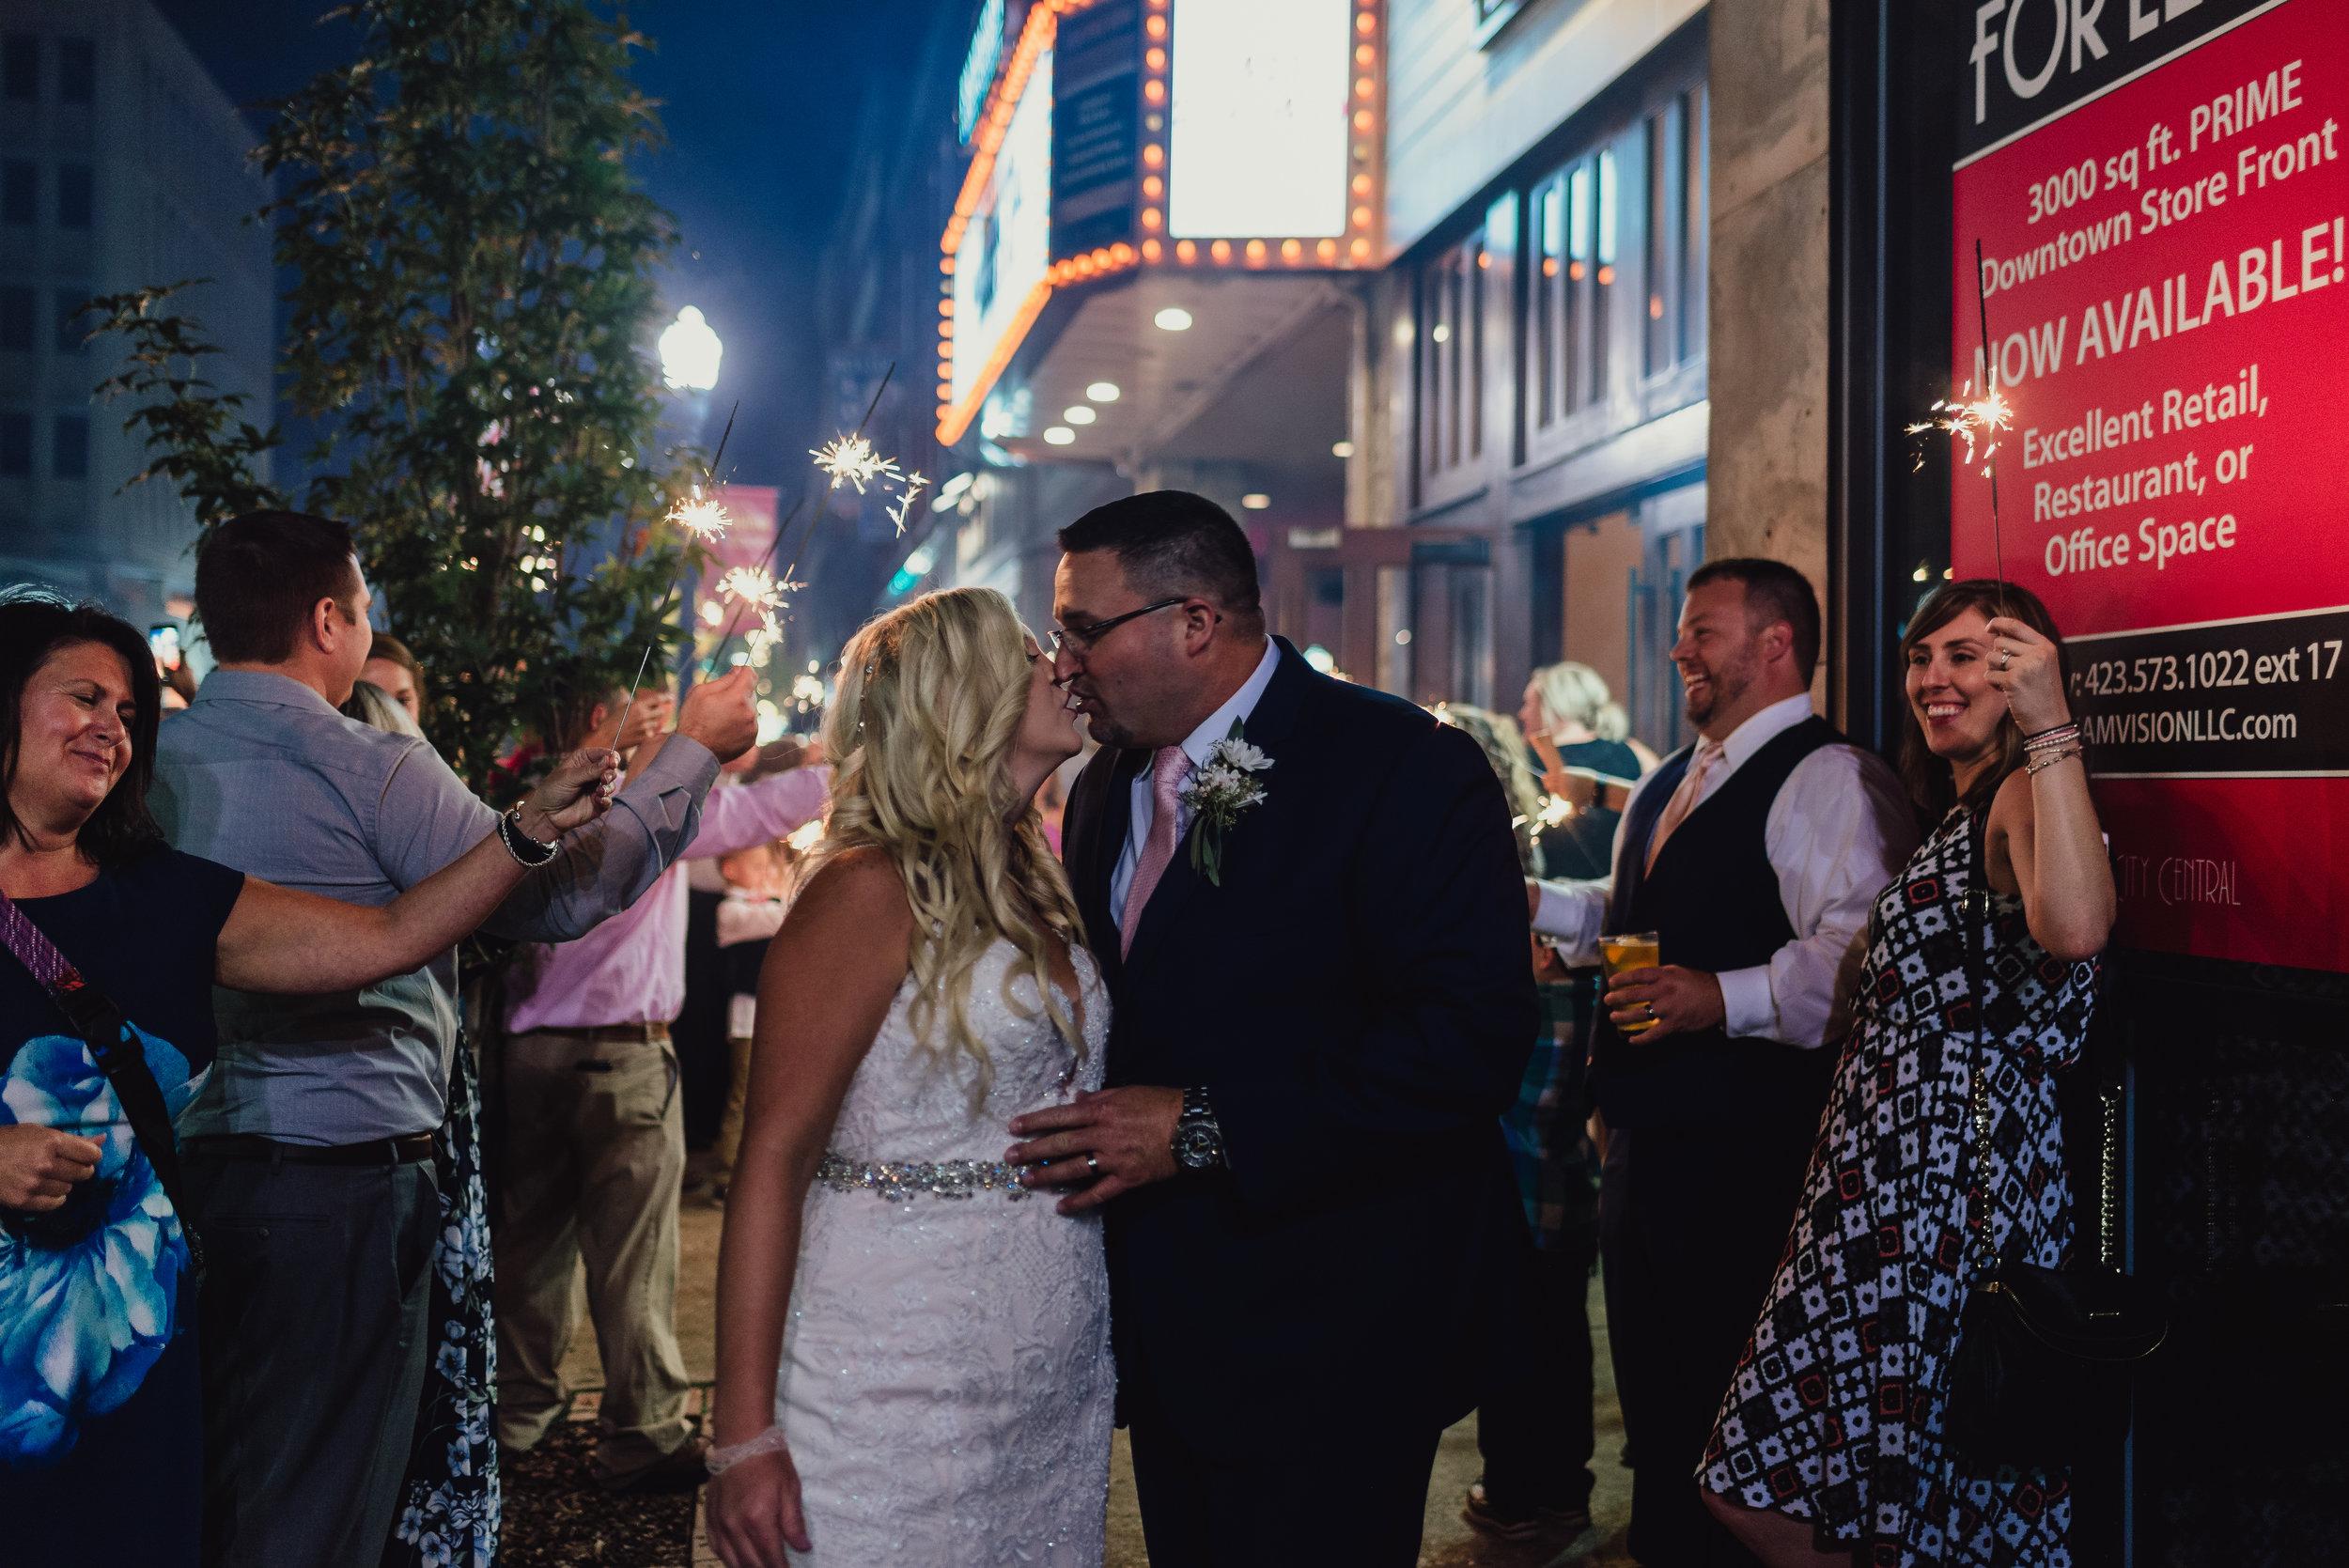 east-tn-wedding-photographer-tennessee-elopement-photographer-kingsport-tn-wedding-photographer (849 of 1001).jpg